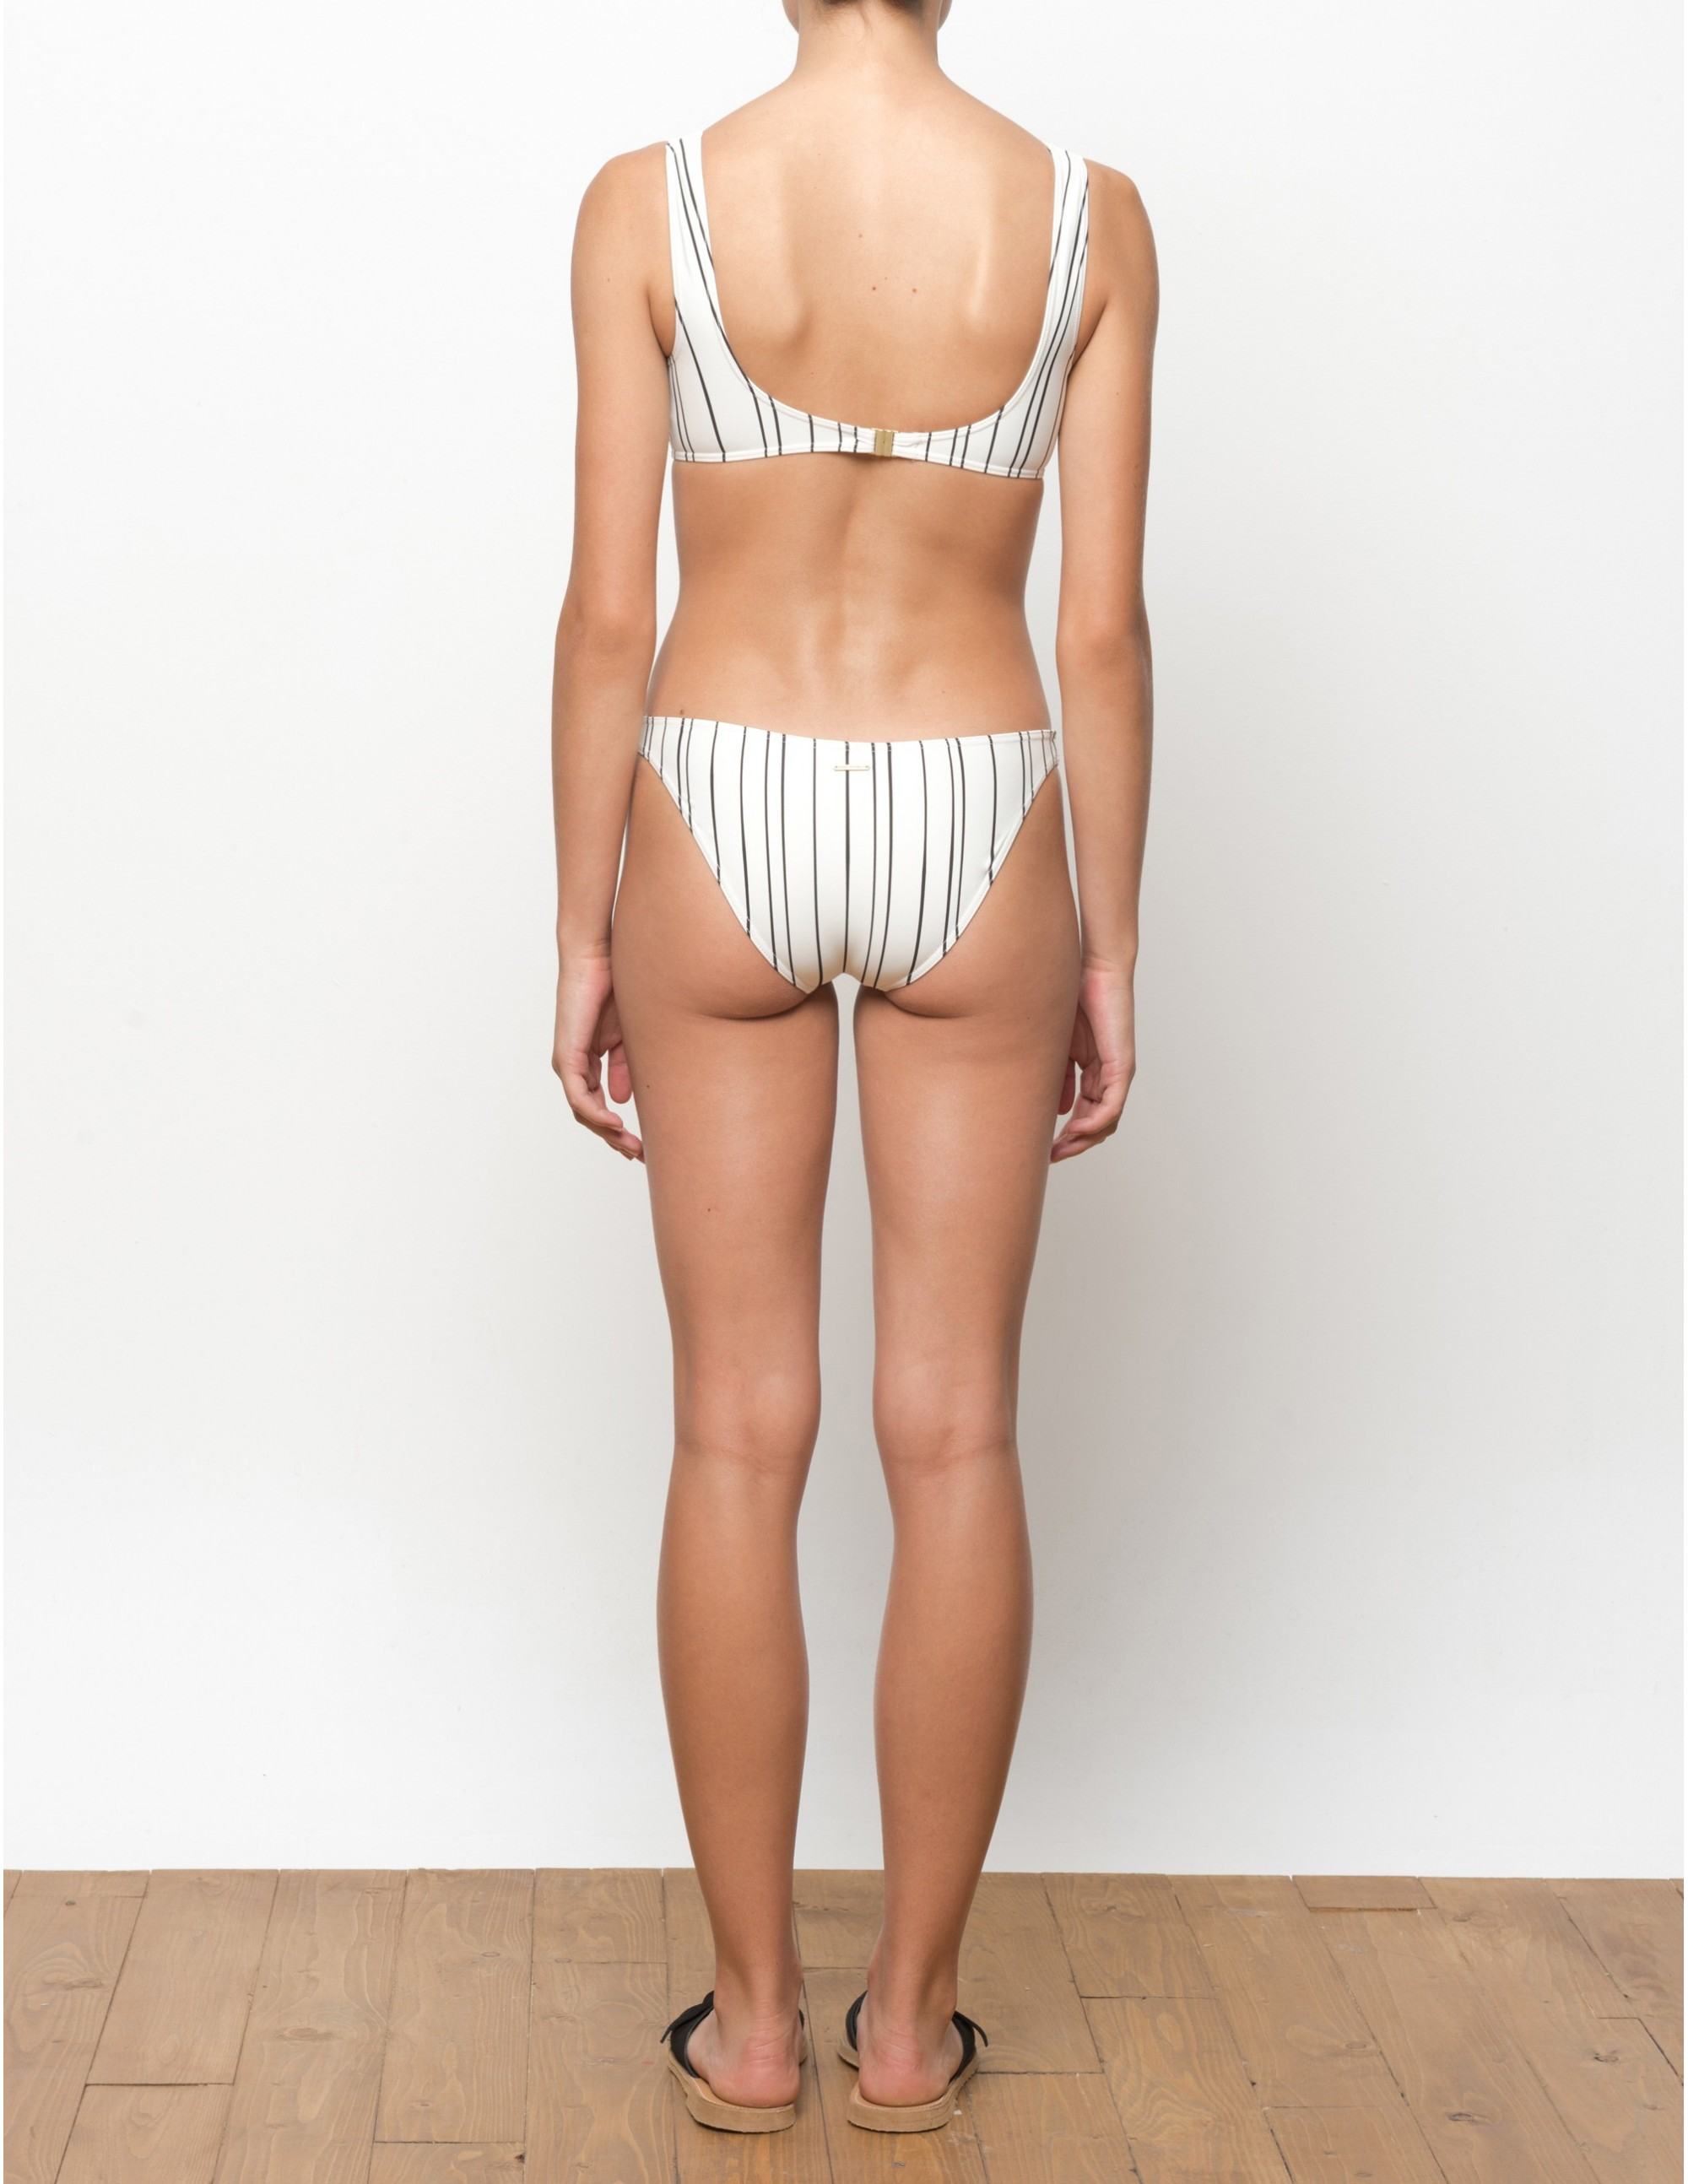 PARAISO bikini bottom - LIMITLESS